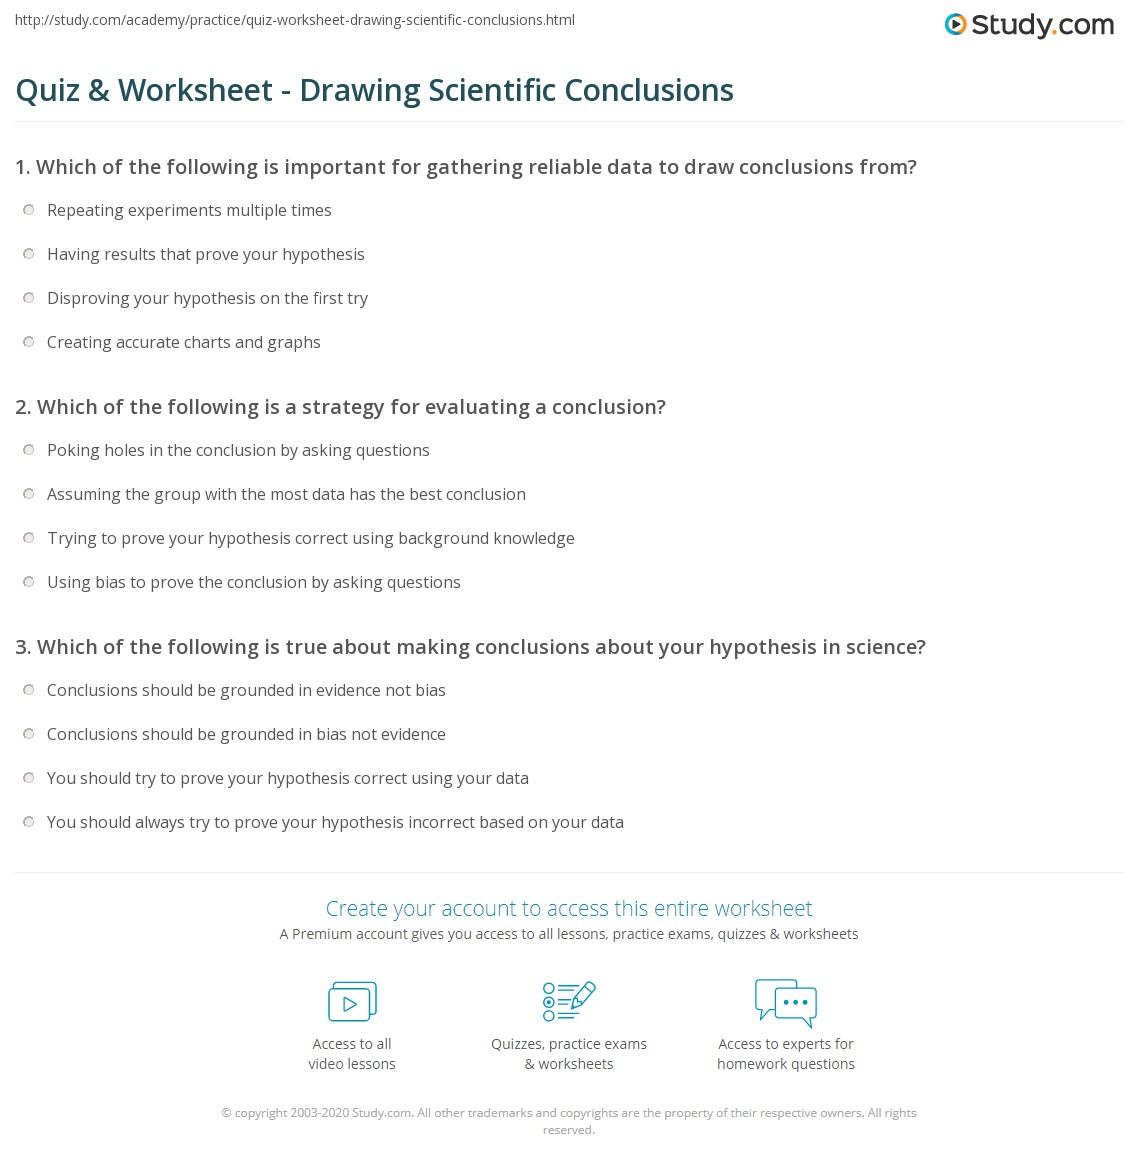 Quiz & Worksheet - Drawing Scientific Conclusions | Study.com